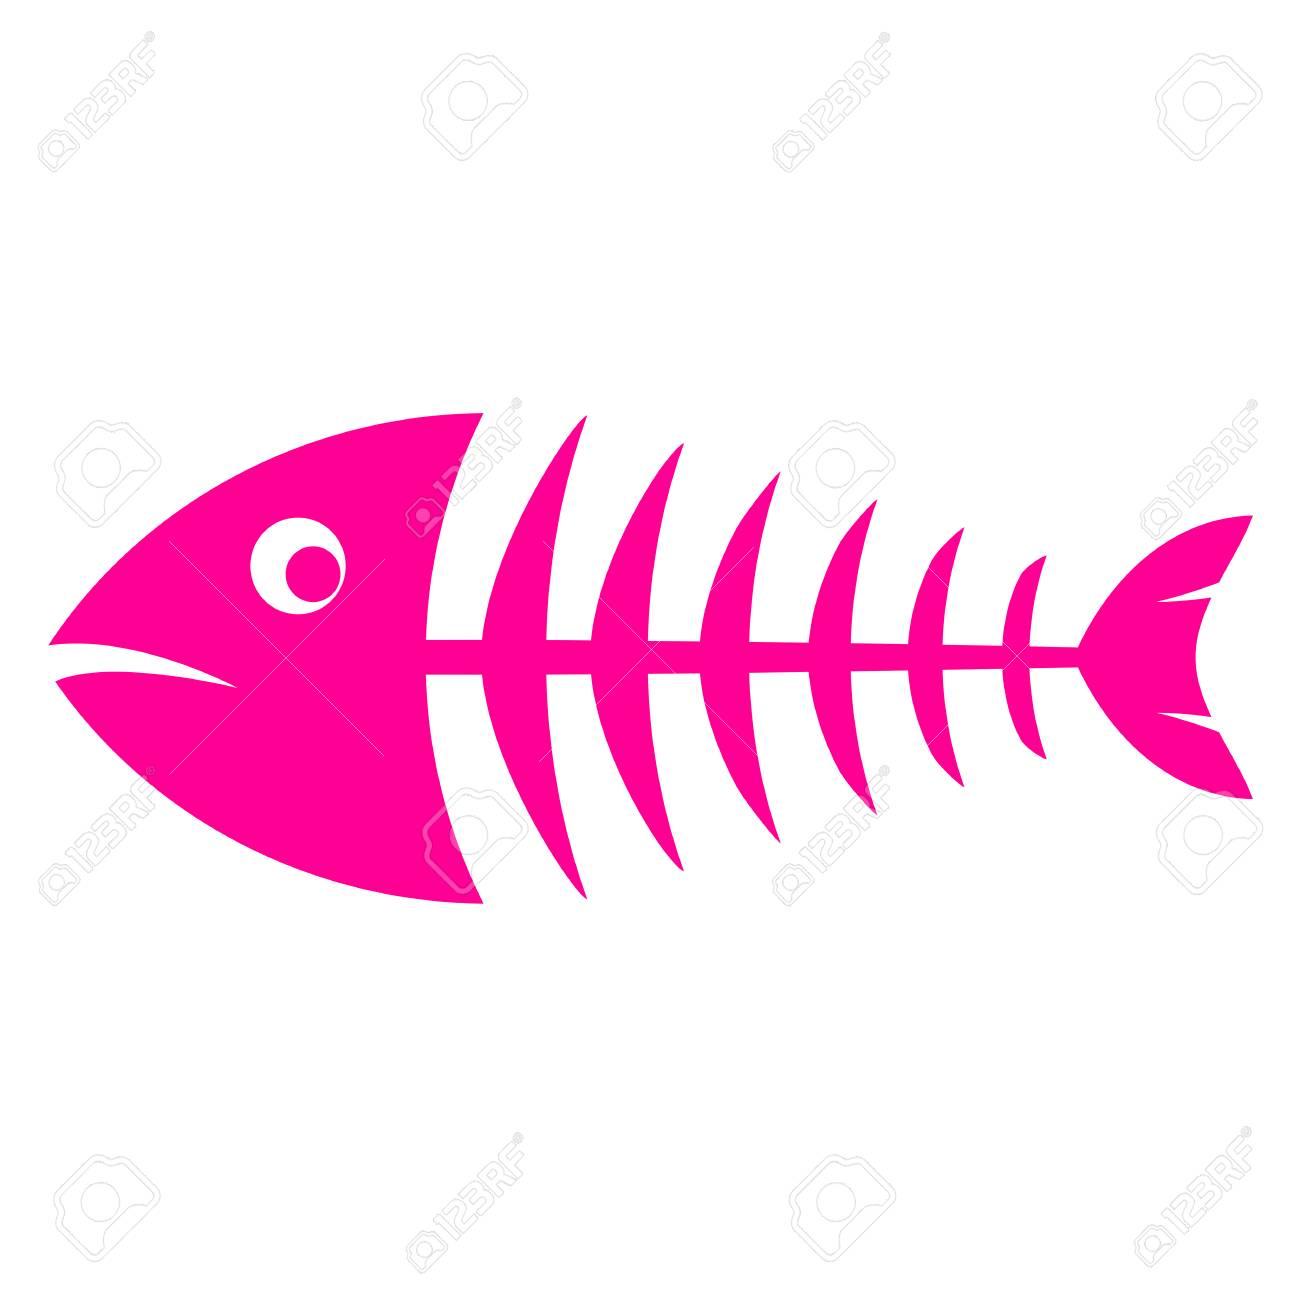 Pink fishbone vector icon - 94520175